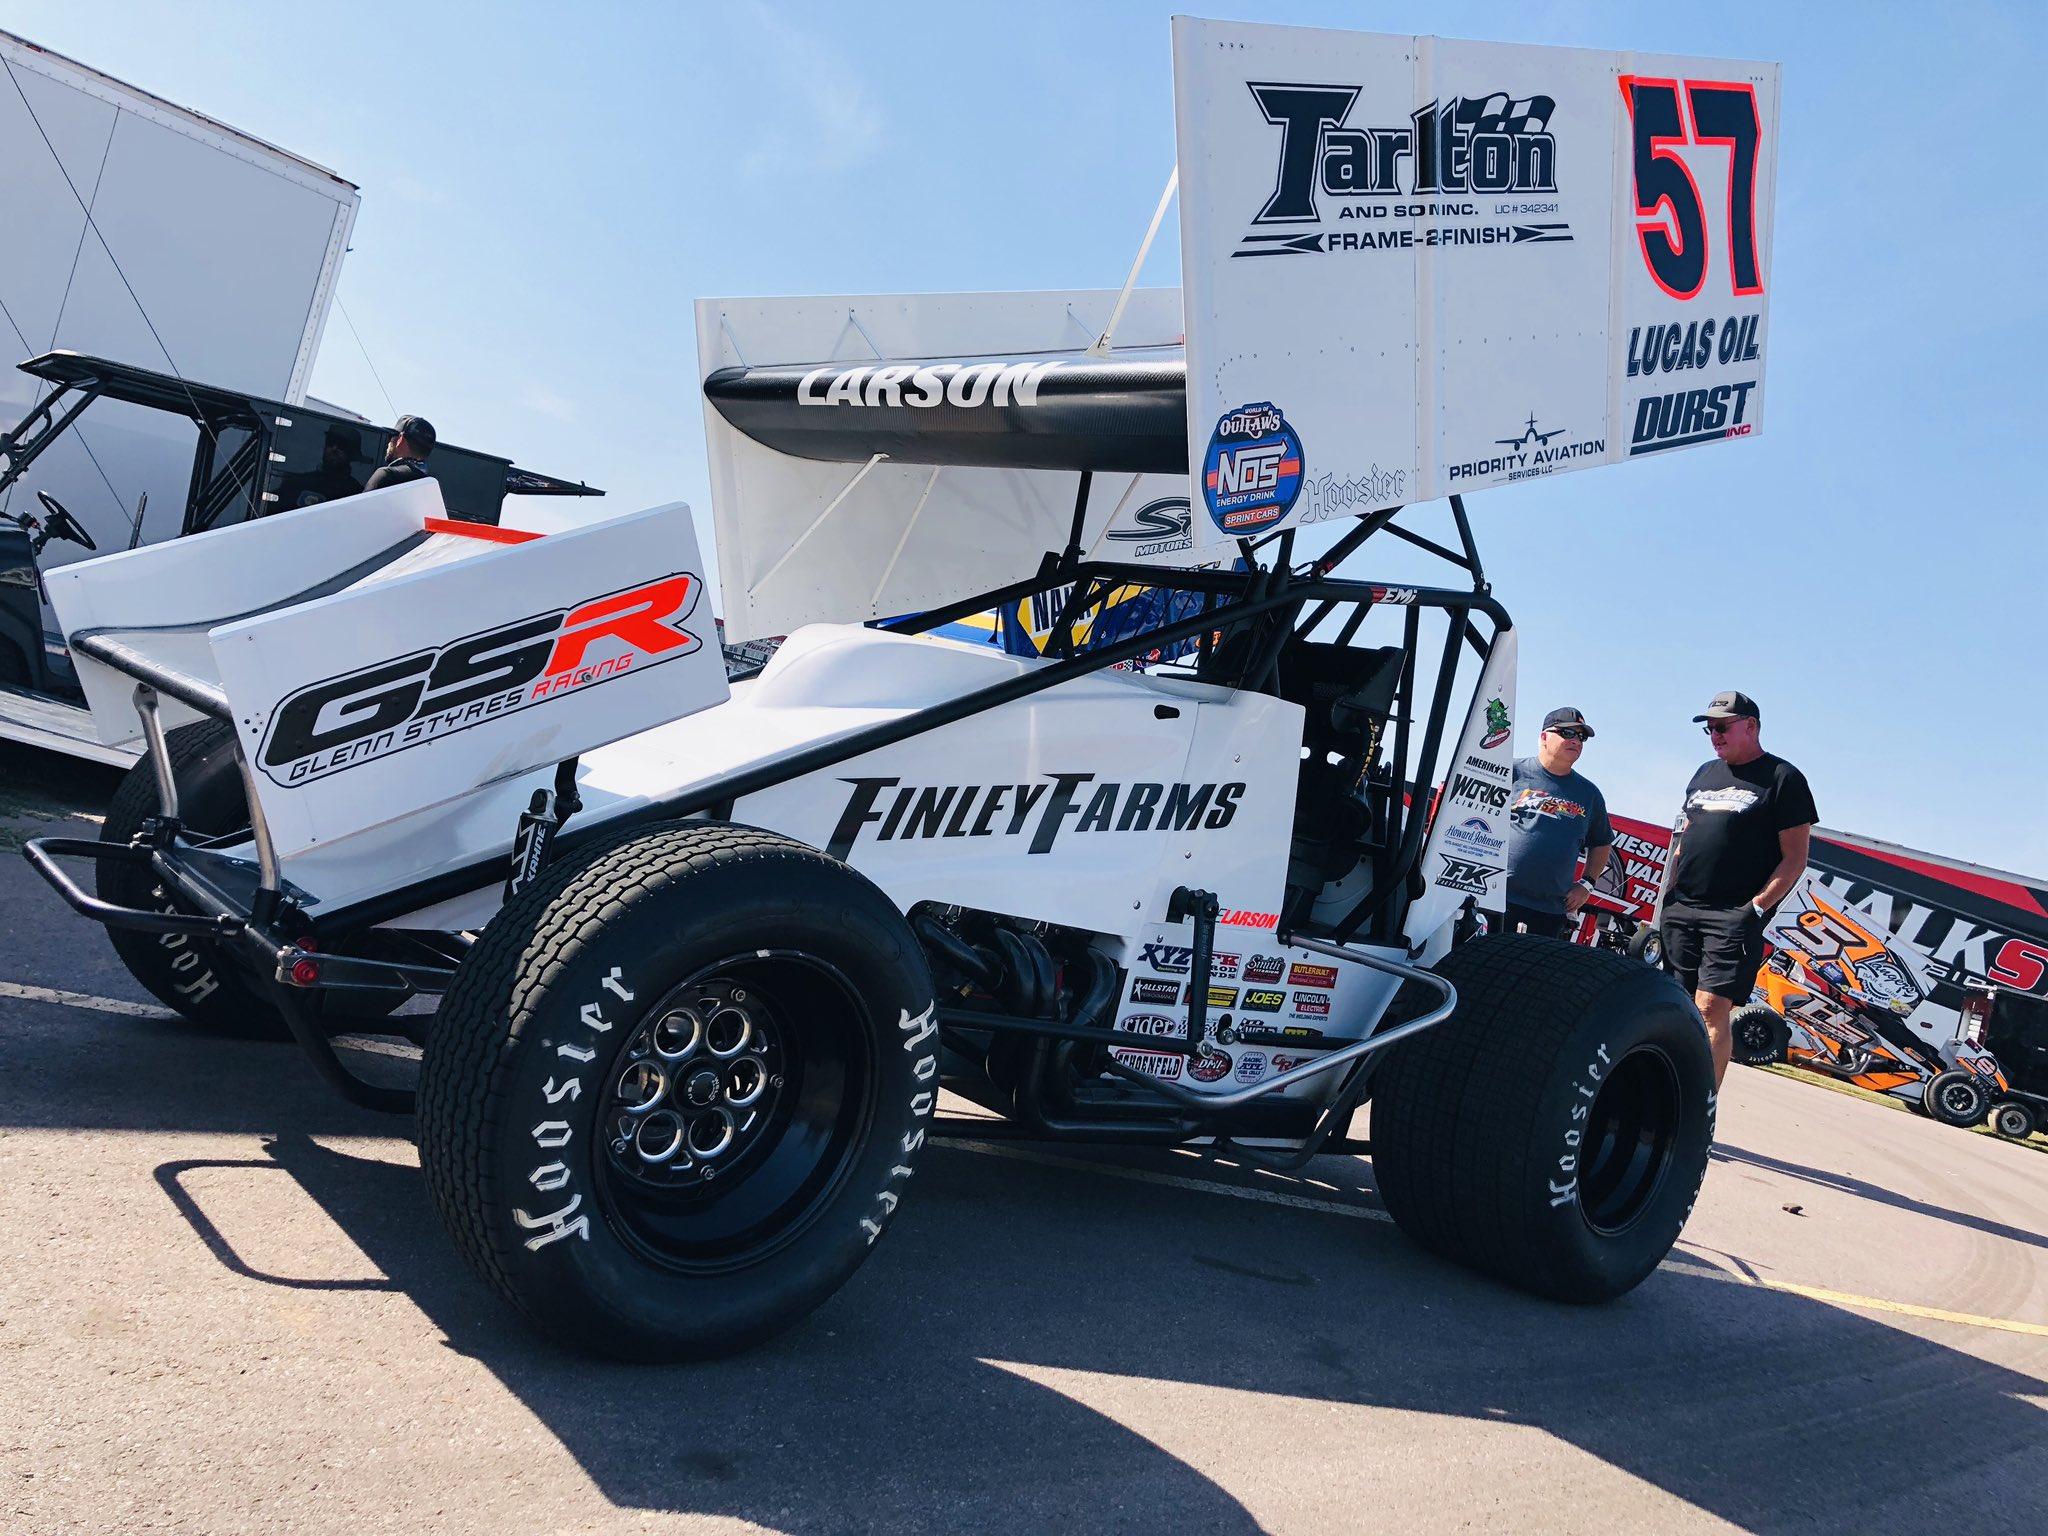 Kyle Larson - Dirt Sprint Car No 57